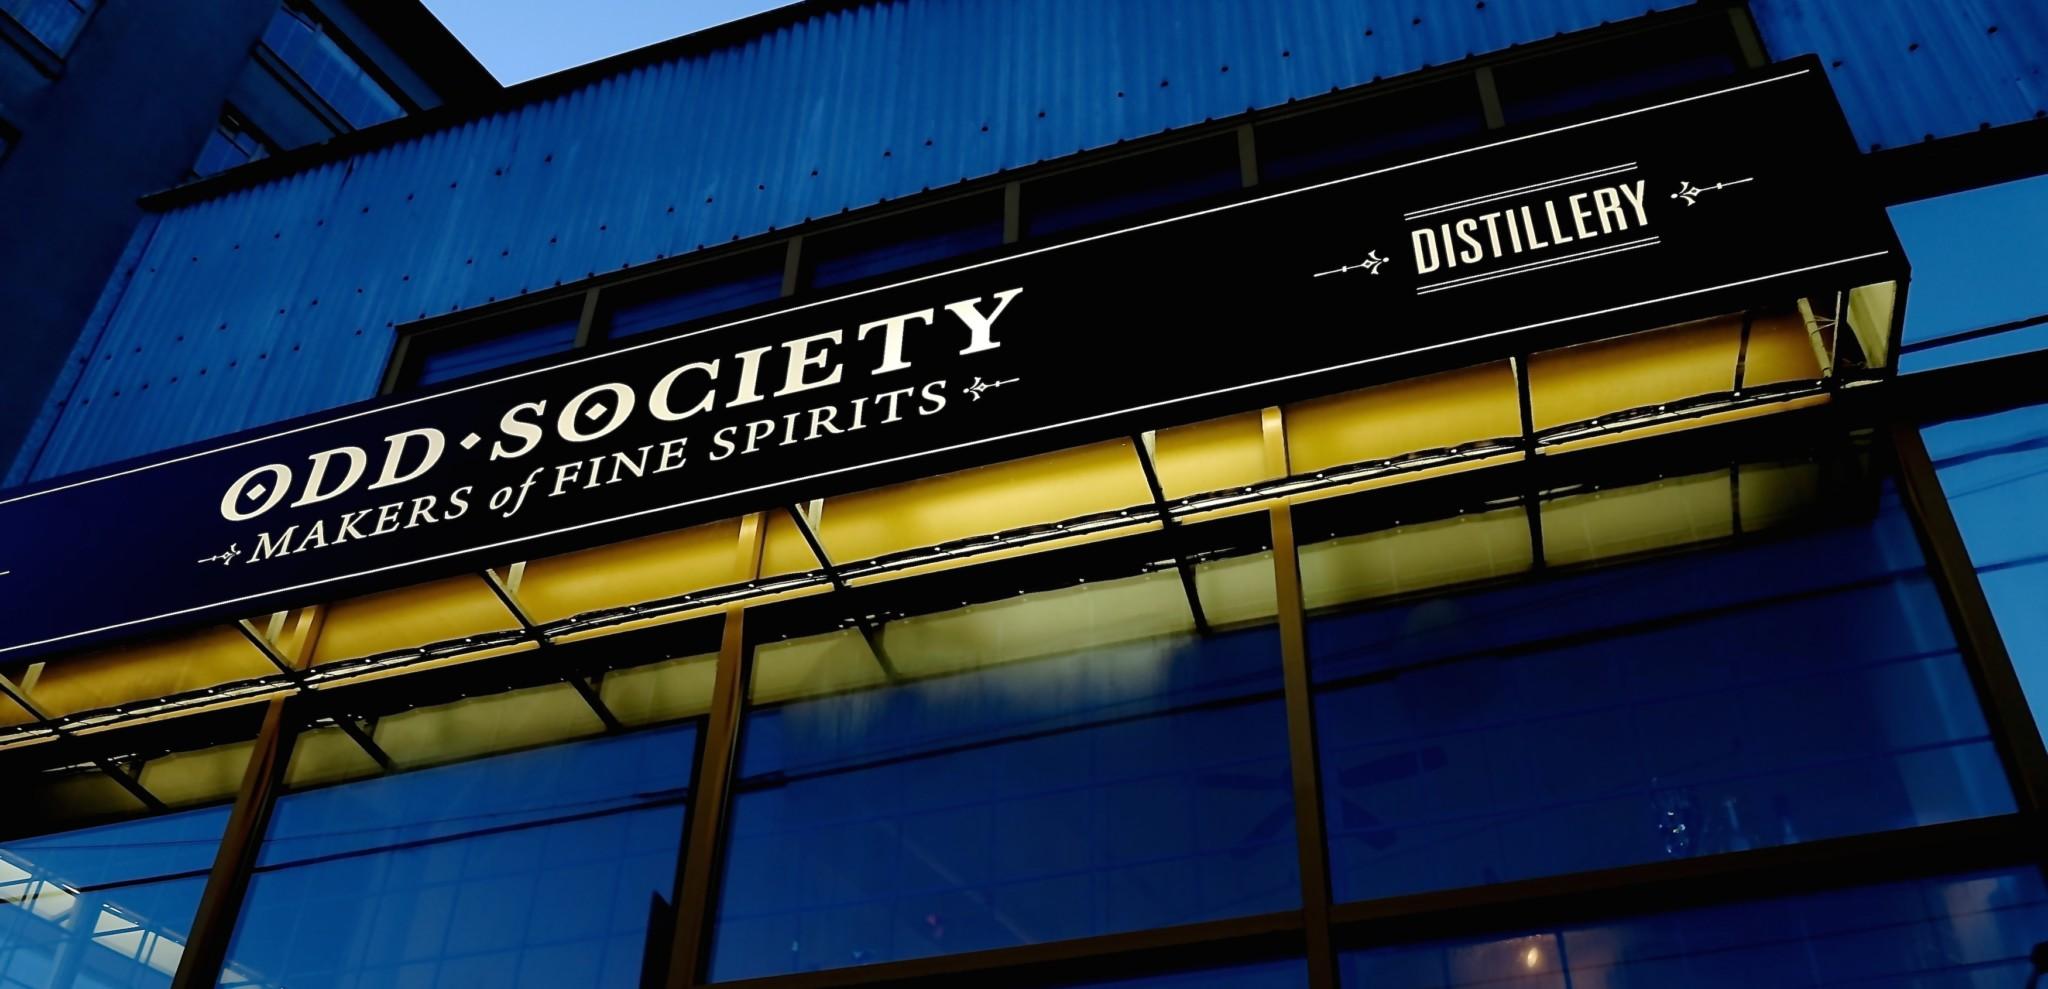 #MarketMonday Odd Society Spirits award winning Cassis